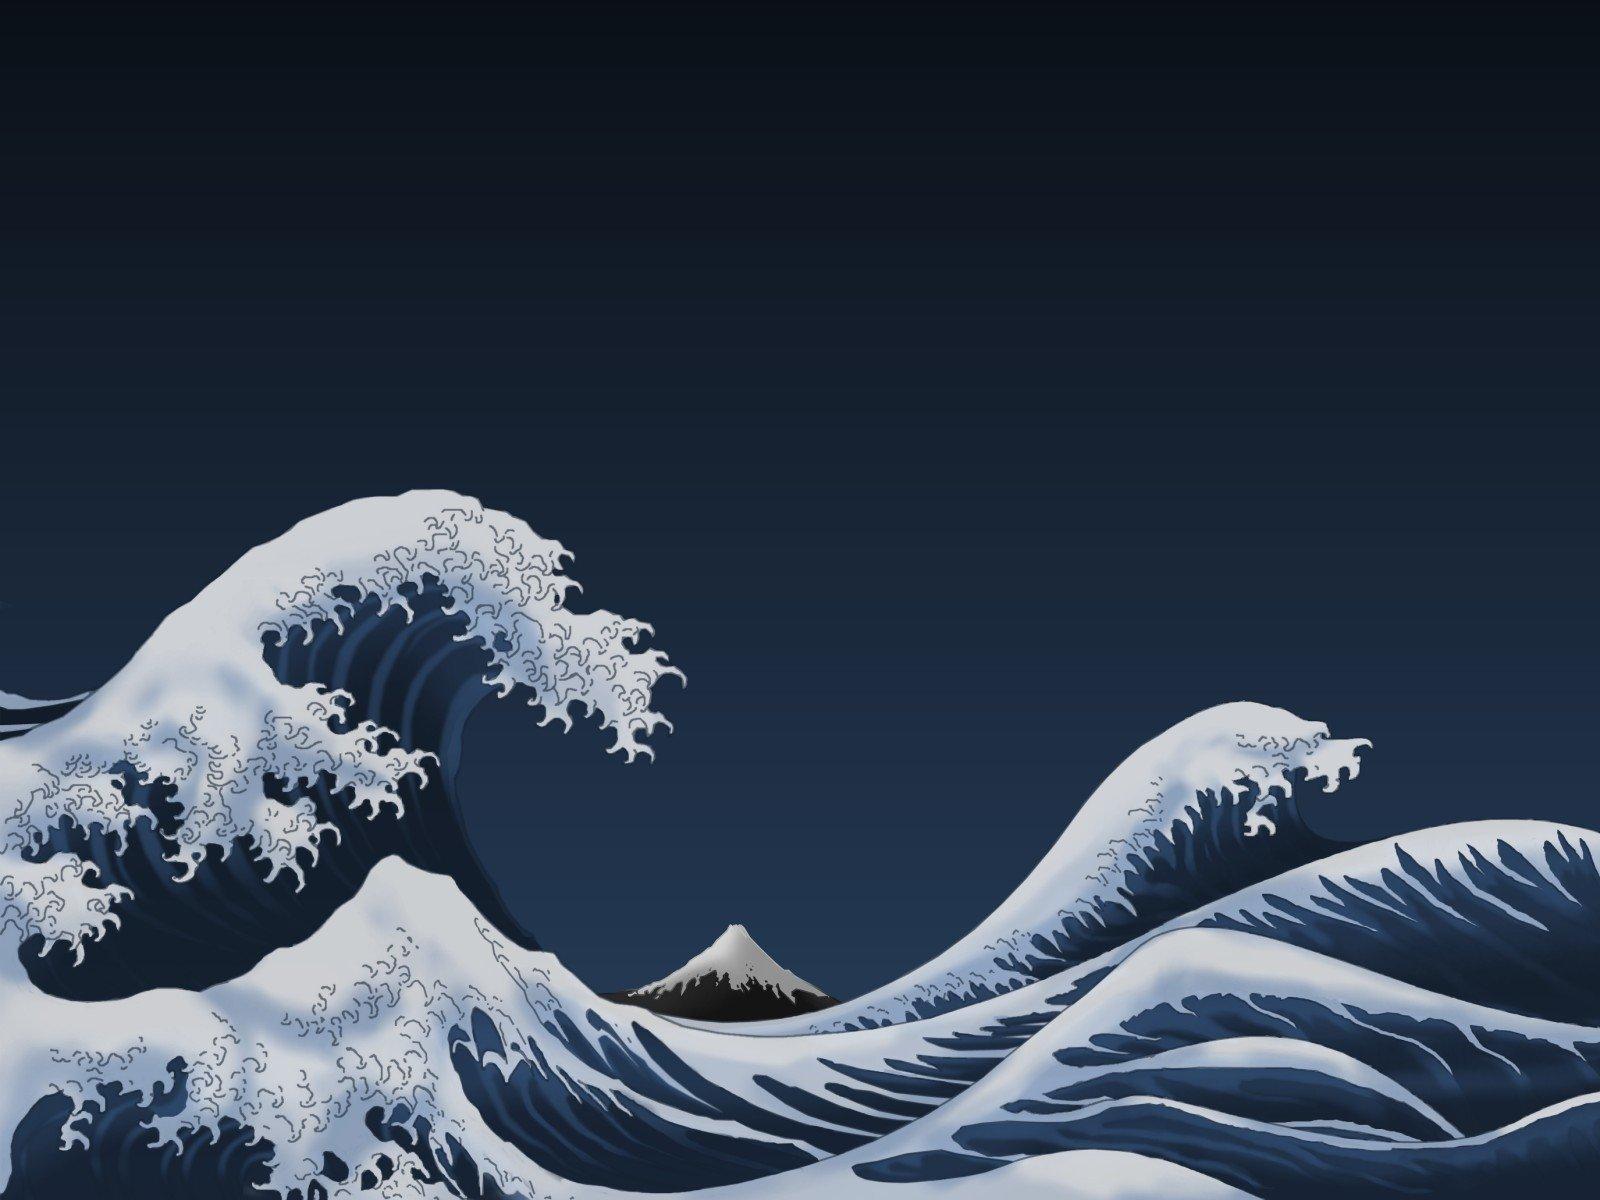 Wallpapers Id Great Wave Off Kanagawa 2185831 Hd